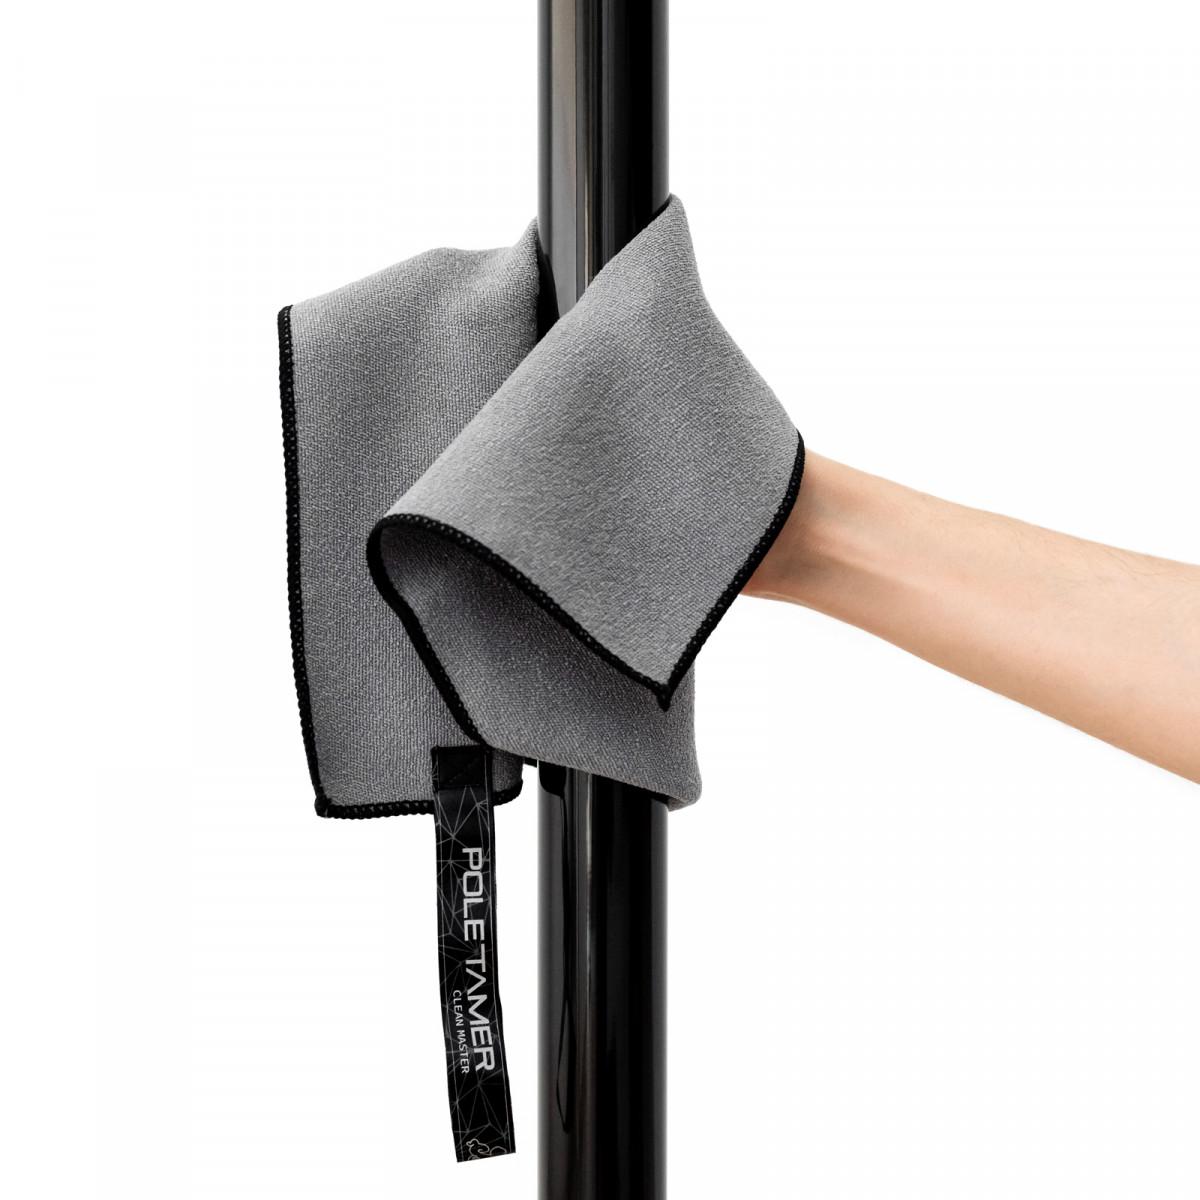 Pole Tamer - Clean master